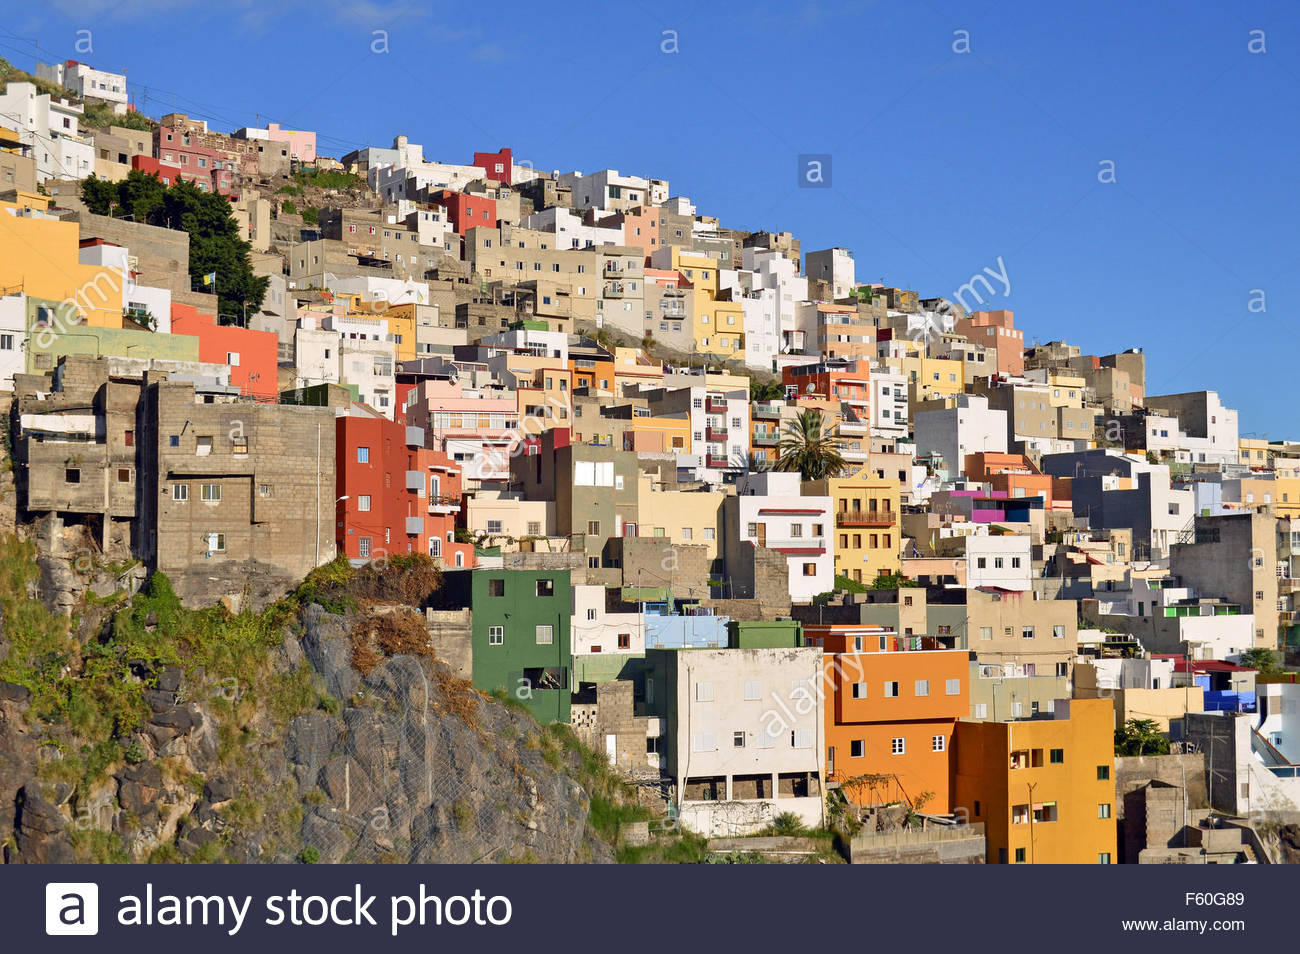 traditional colorful houses hilltop santa cruz de tenerife canary islands spain